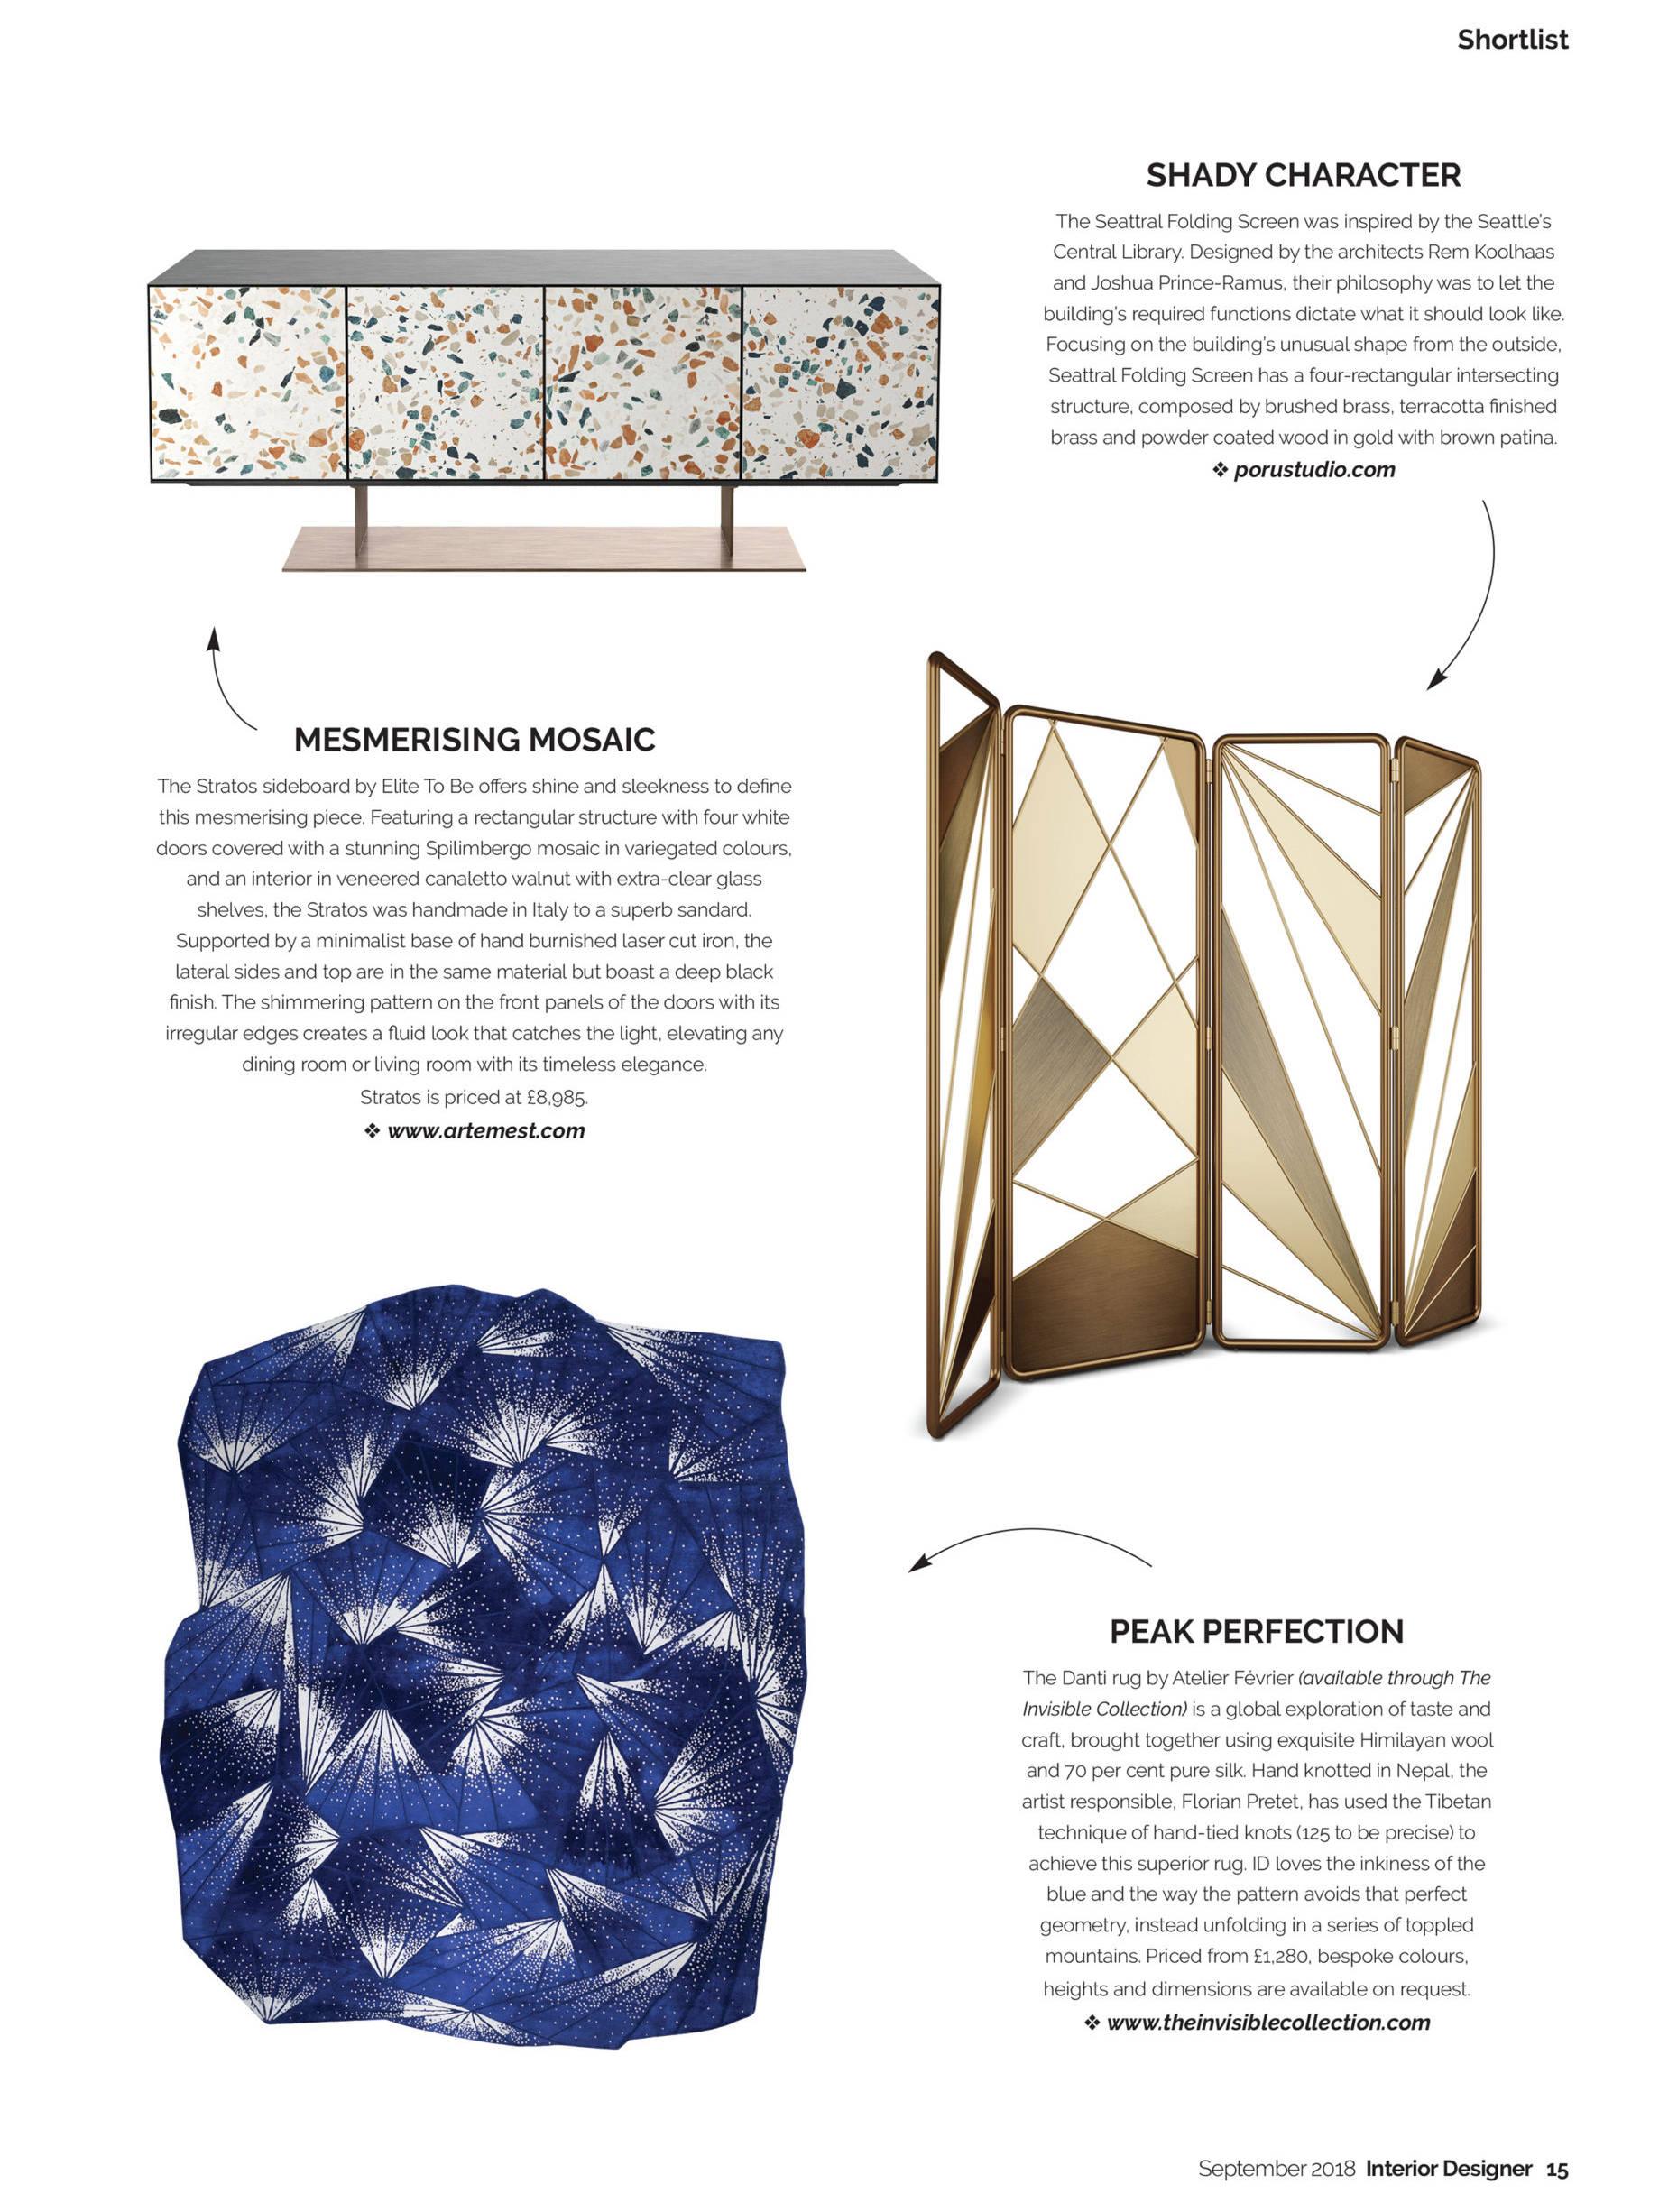 idt magazine 2018 september seattral folding screen